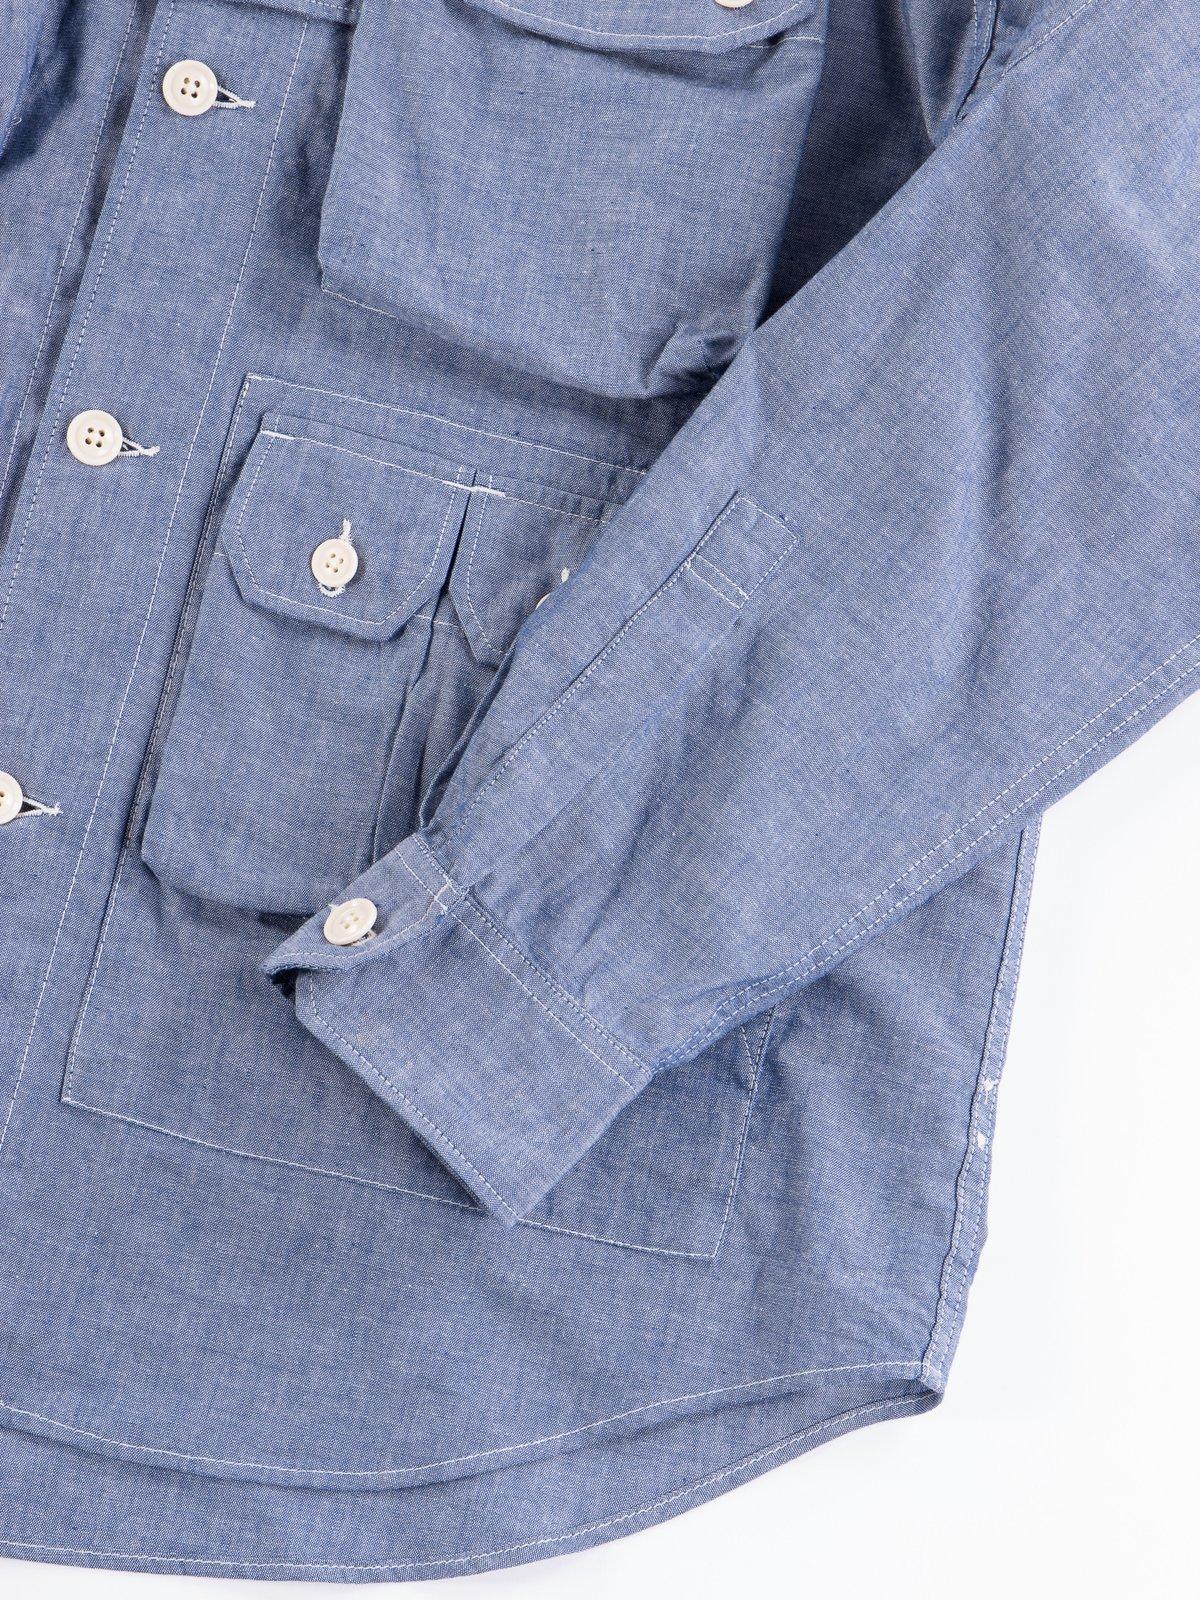 Blue Cotton Chambray Explorer Shirt Jacket - Image 6